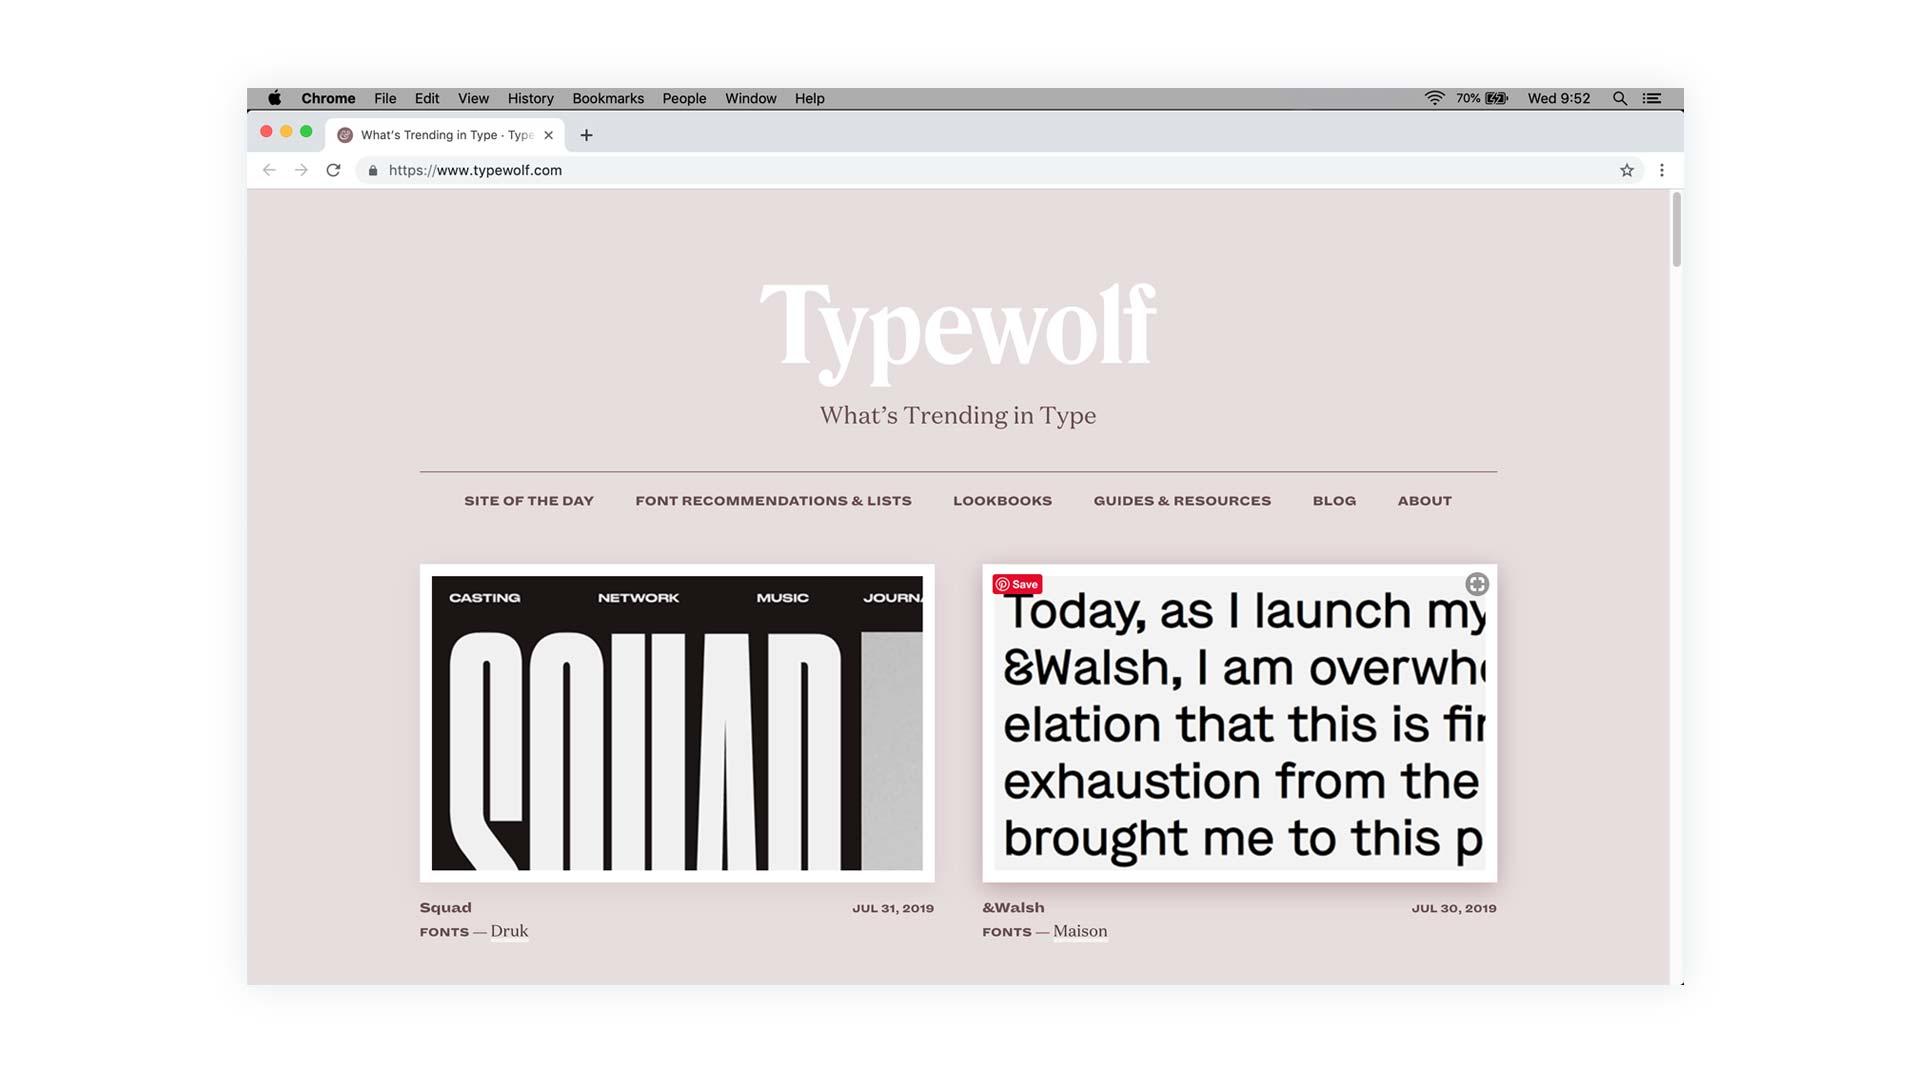 Typewolf.com